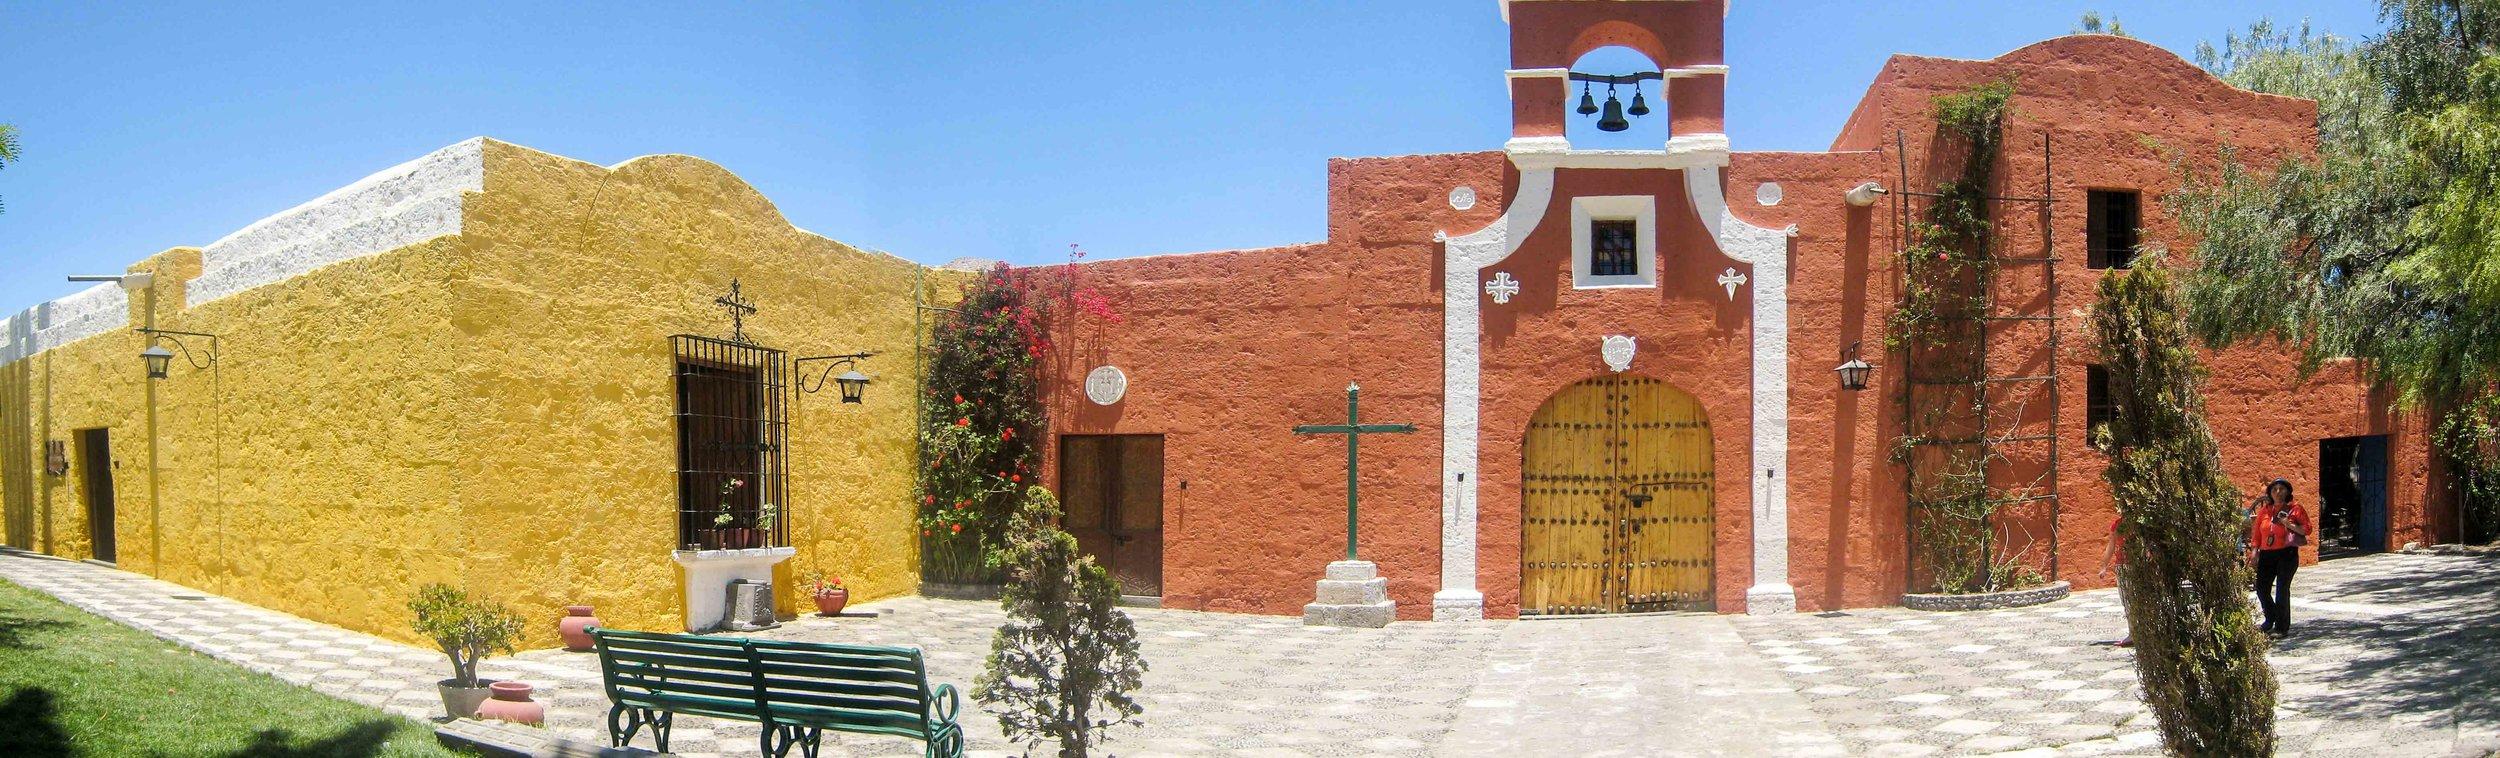 City y Campiña Tour  en Arequipa